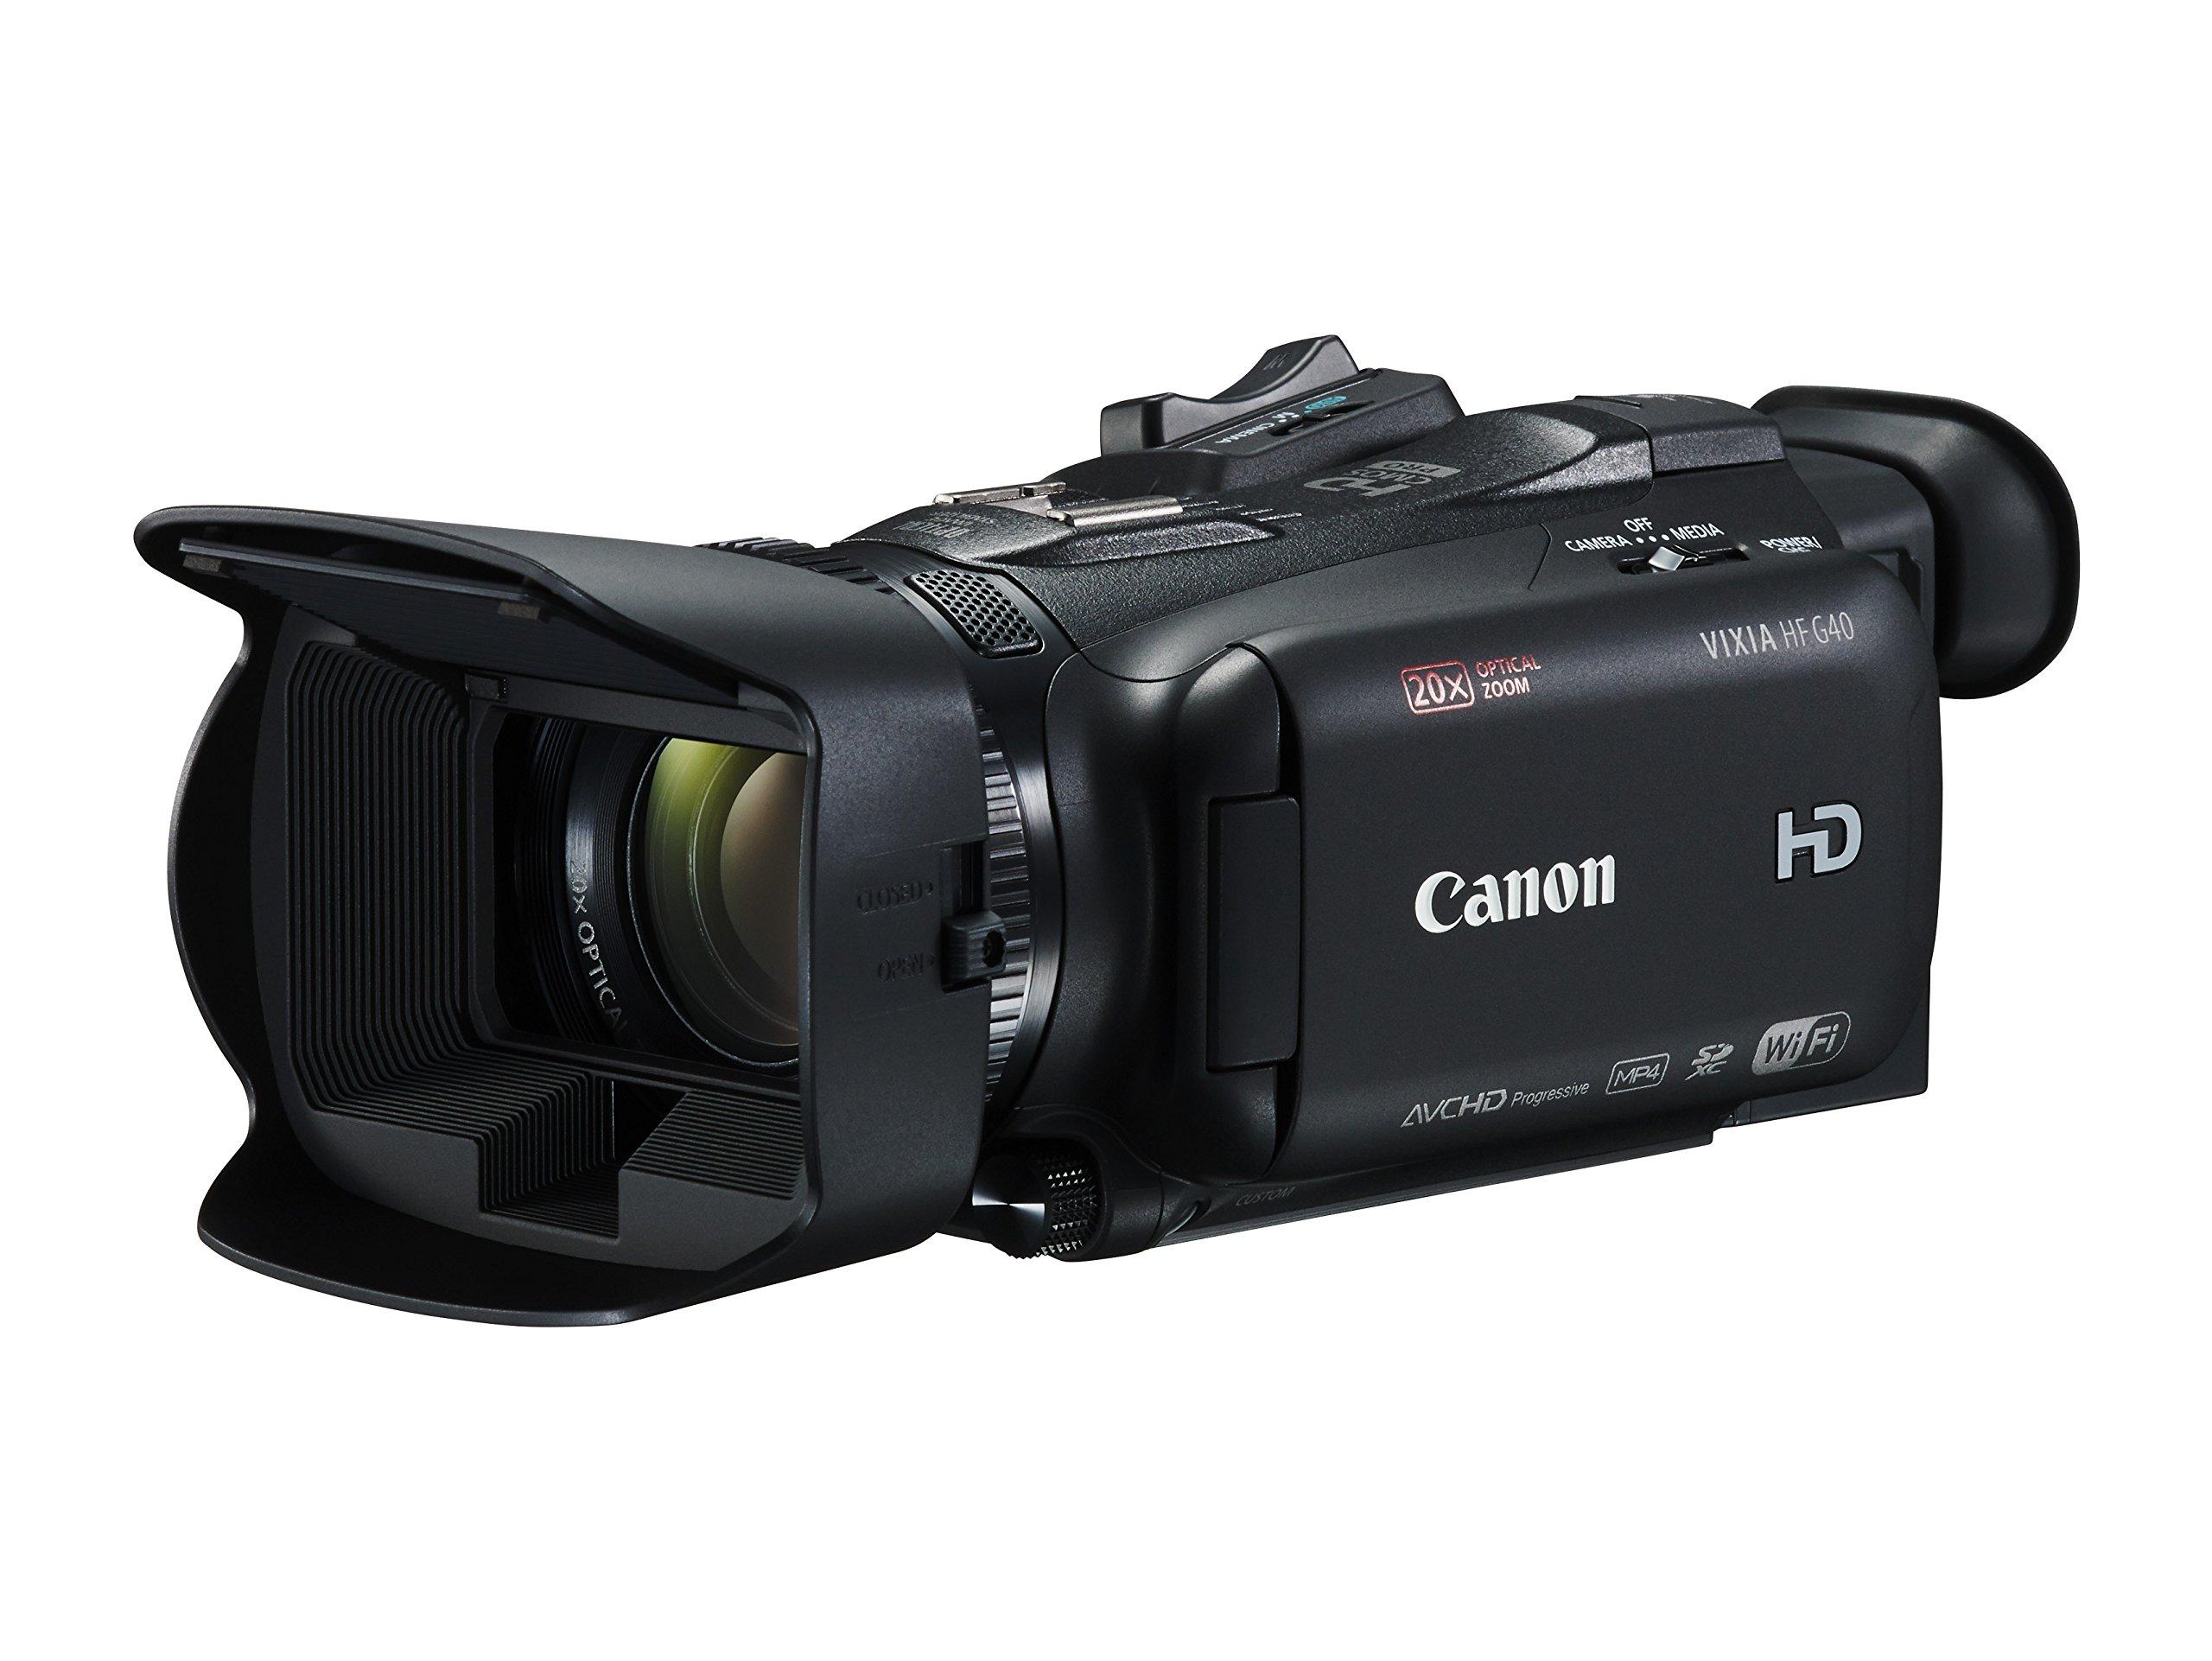 Canon VIXIA HF G40 Full HD Camcorder by Canon (Image #1)